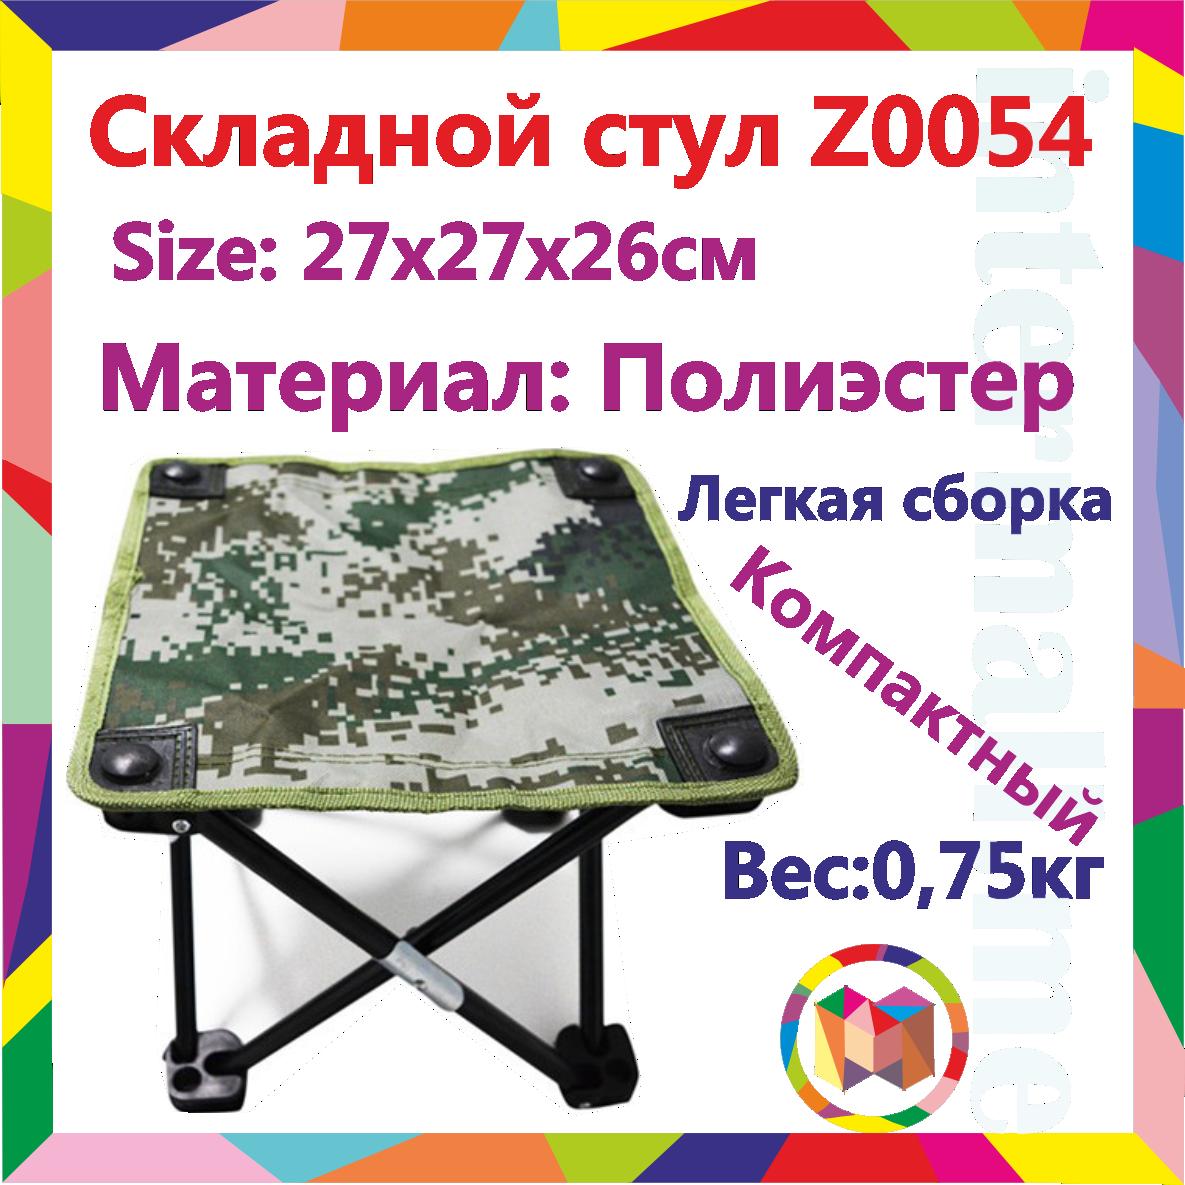 Стул складной для пикника, с металлическим каркасом, 27х27х26 см